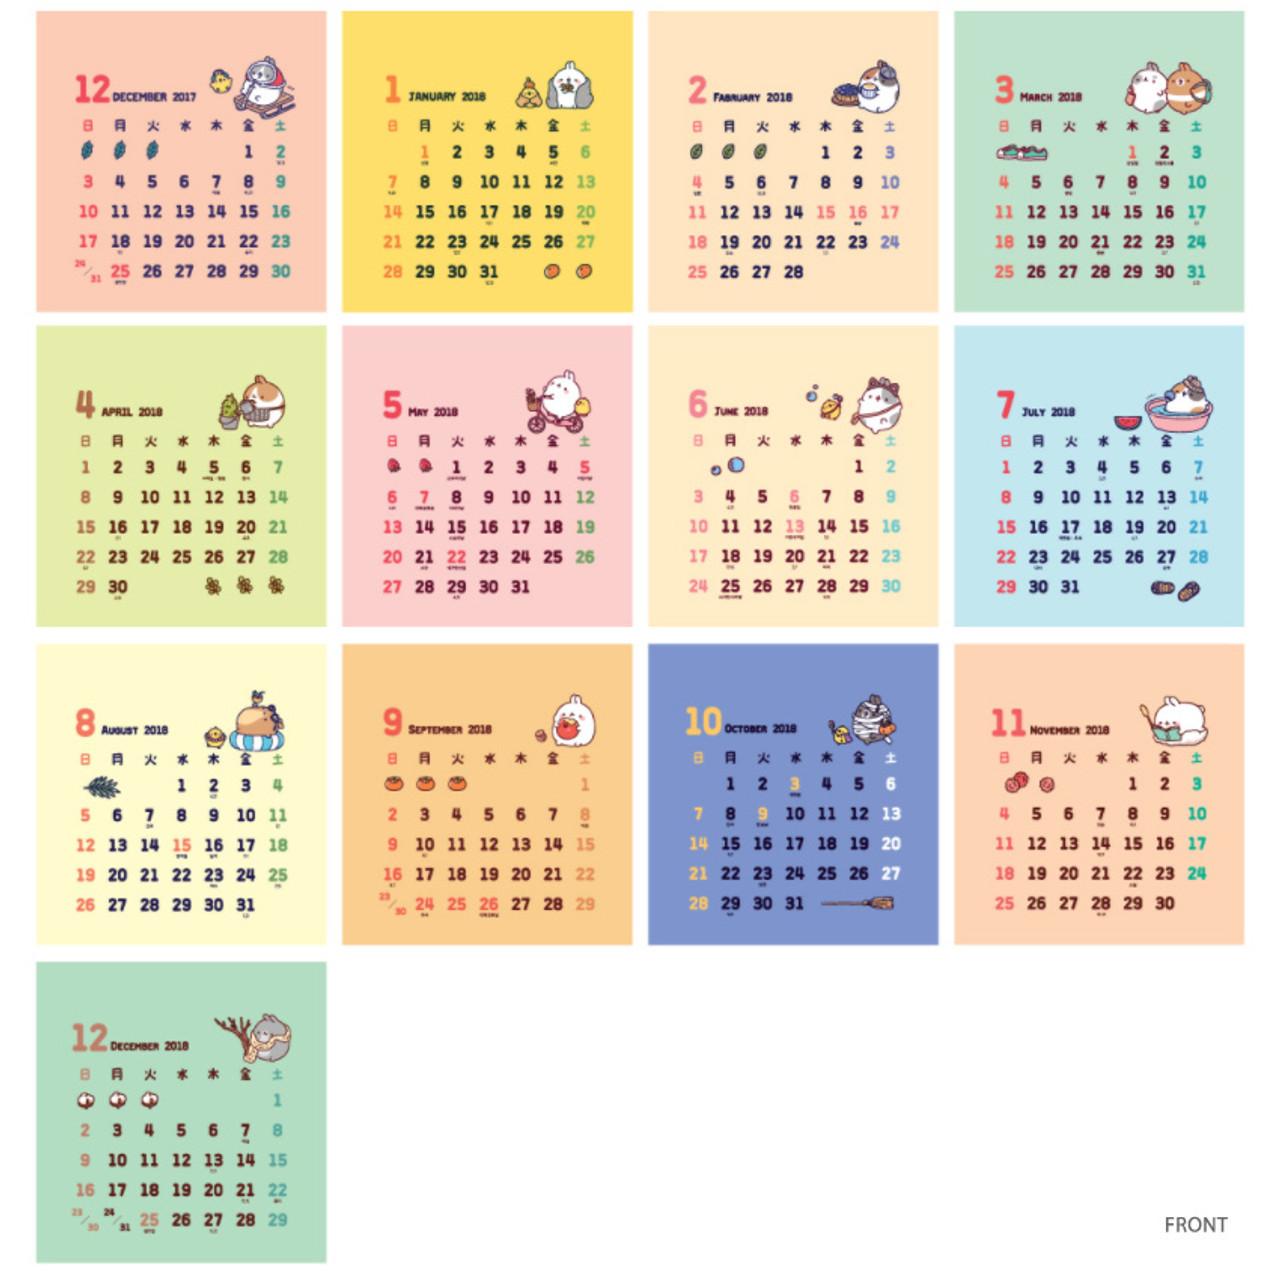 Front 2018 Molang Ilration Small Desk Calendar